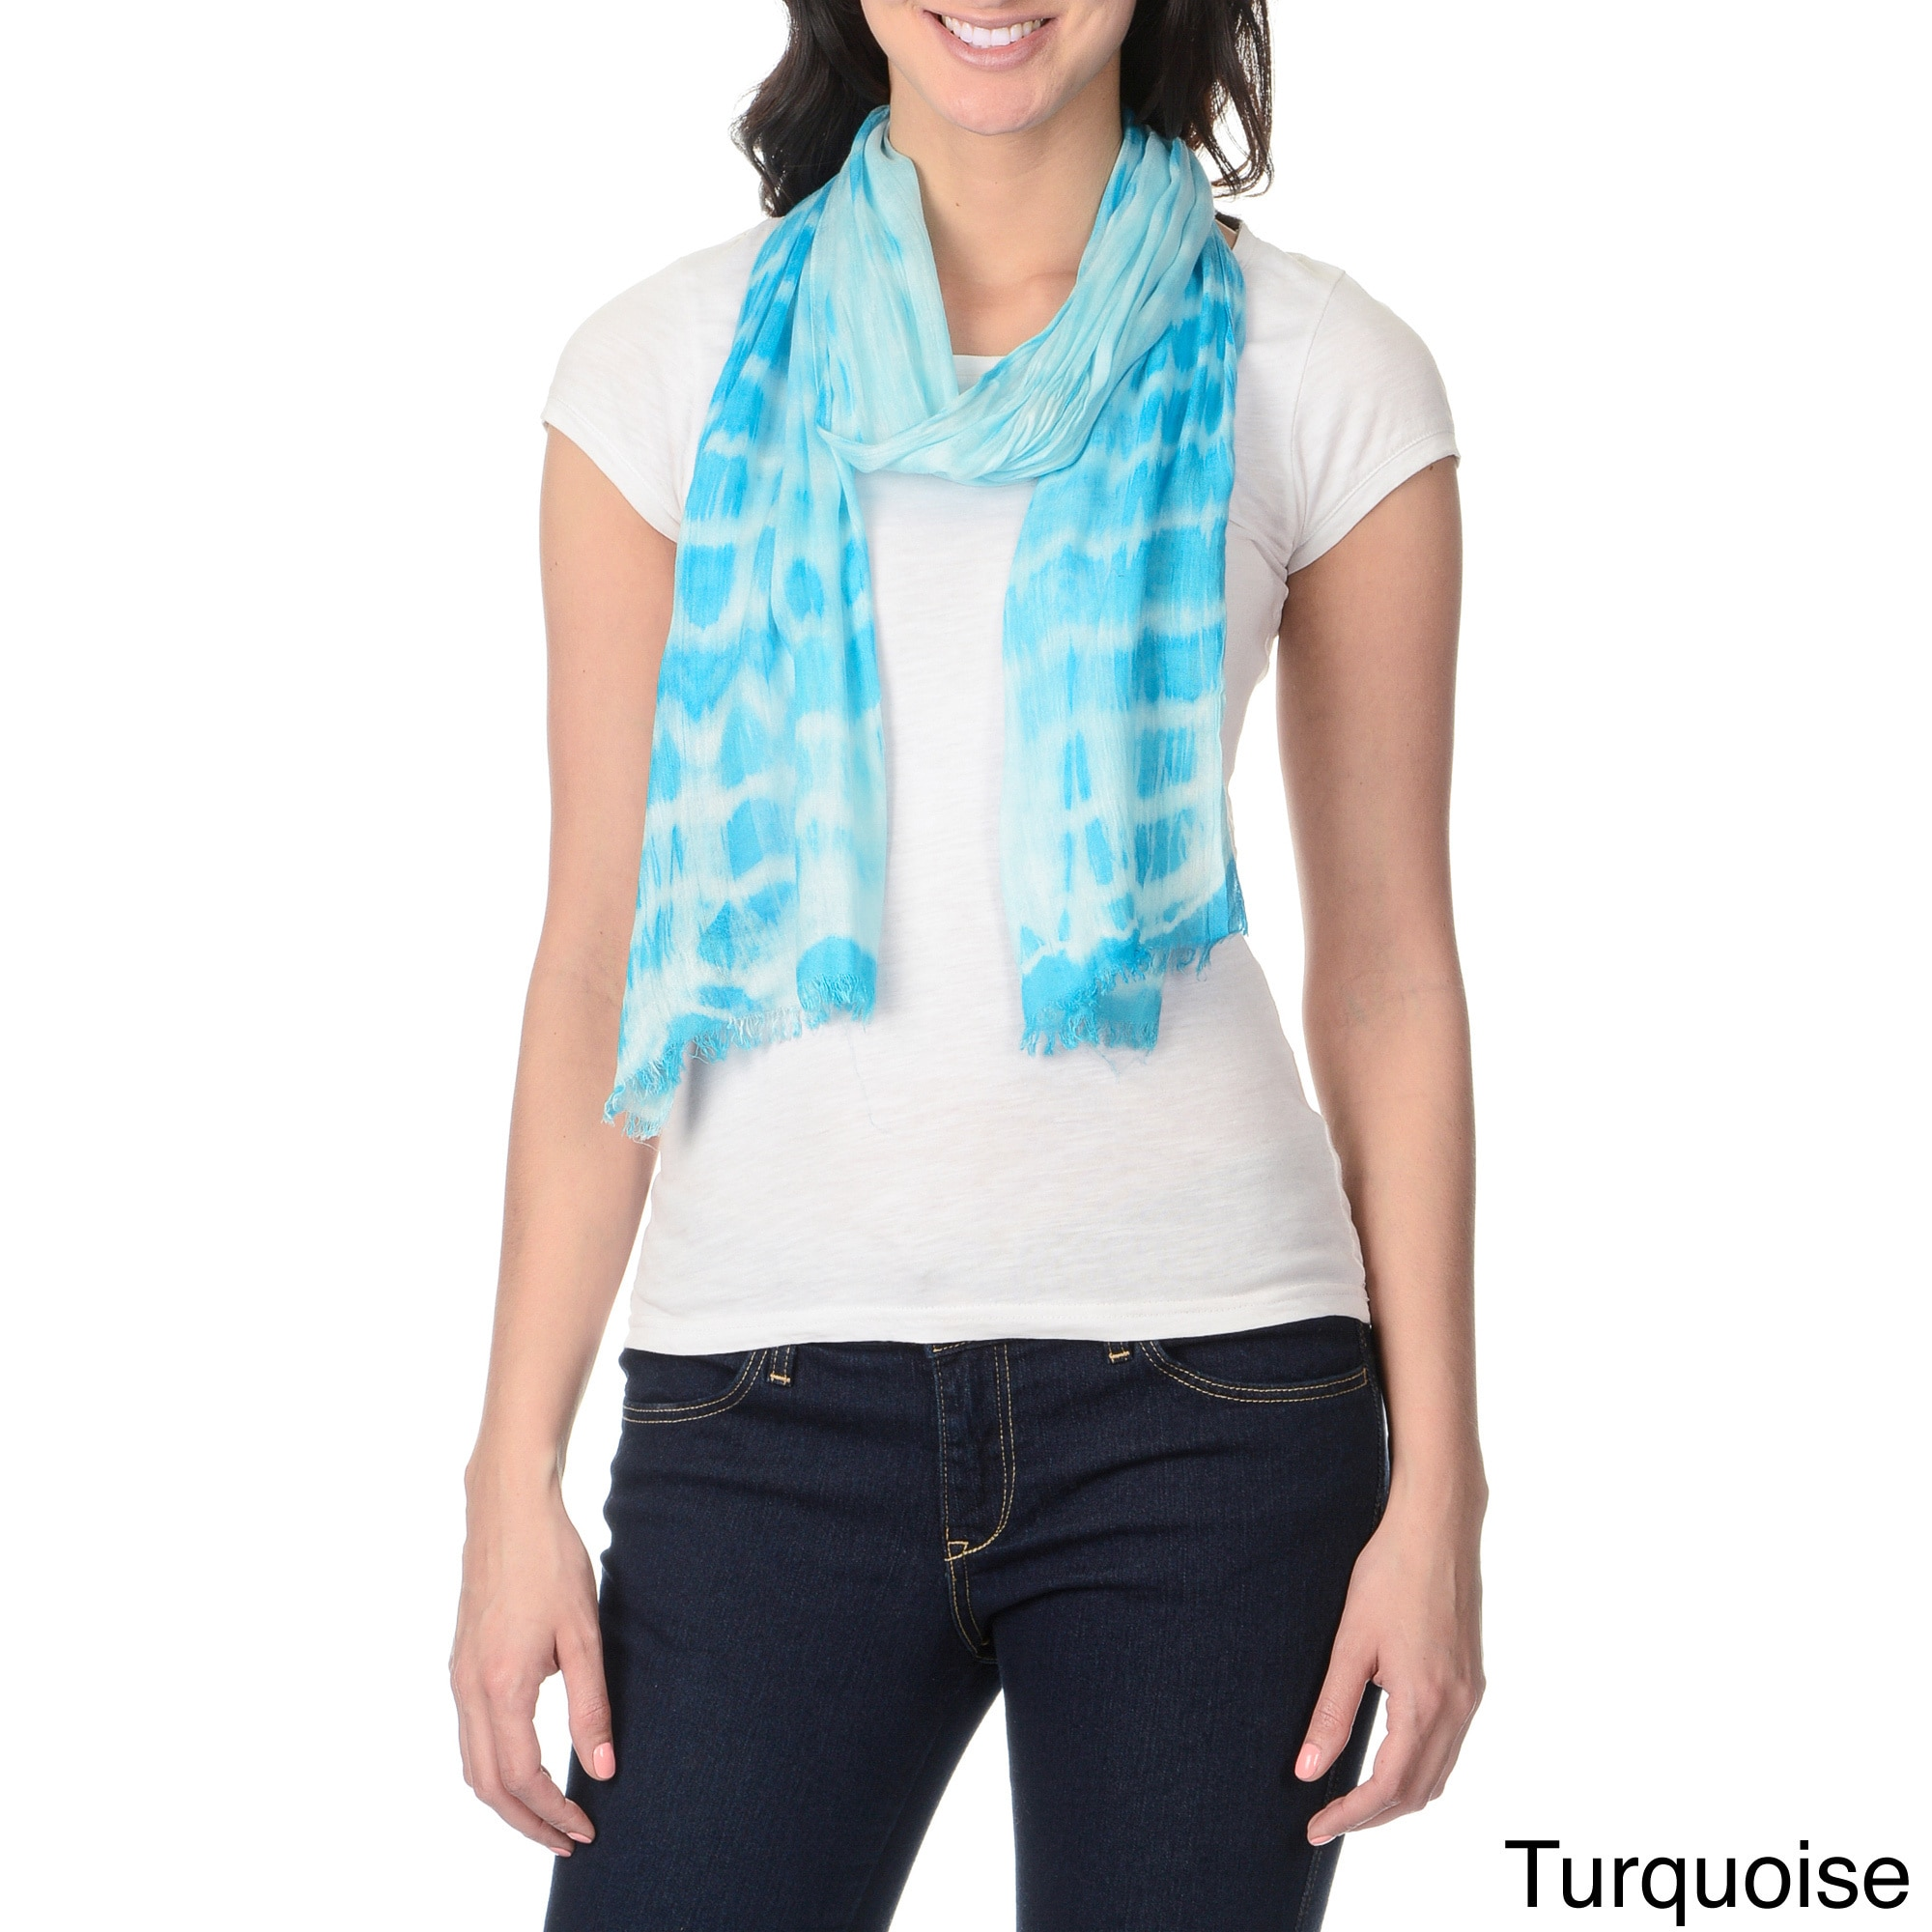 Overstock.com Identity by Magid Women's Tie-dye Print Lightweight Scarf at Sears.com